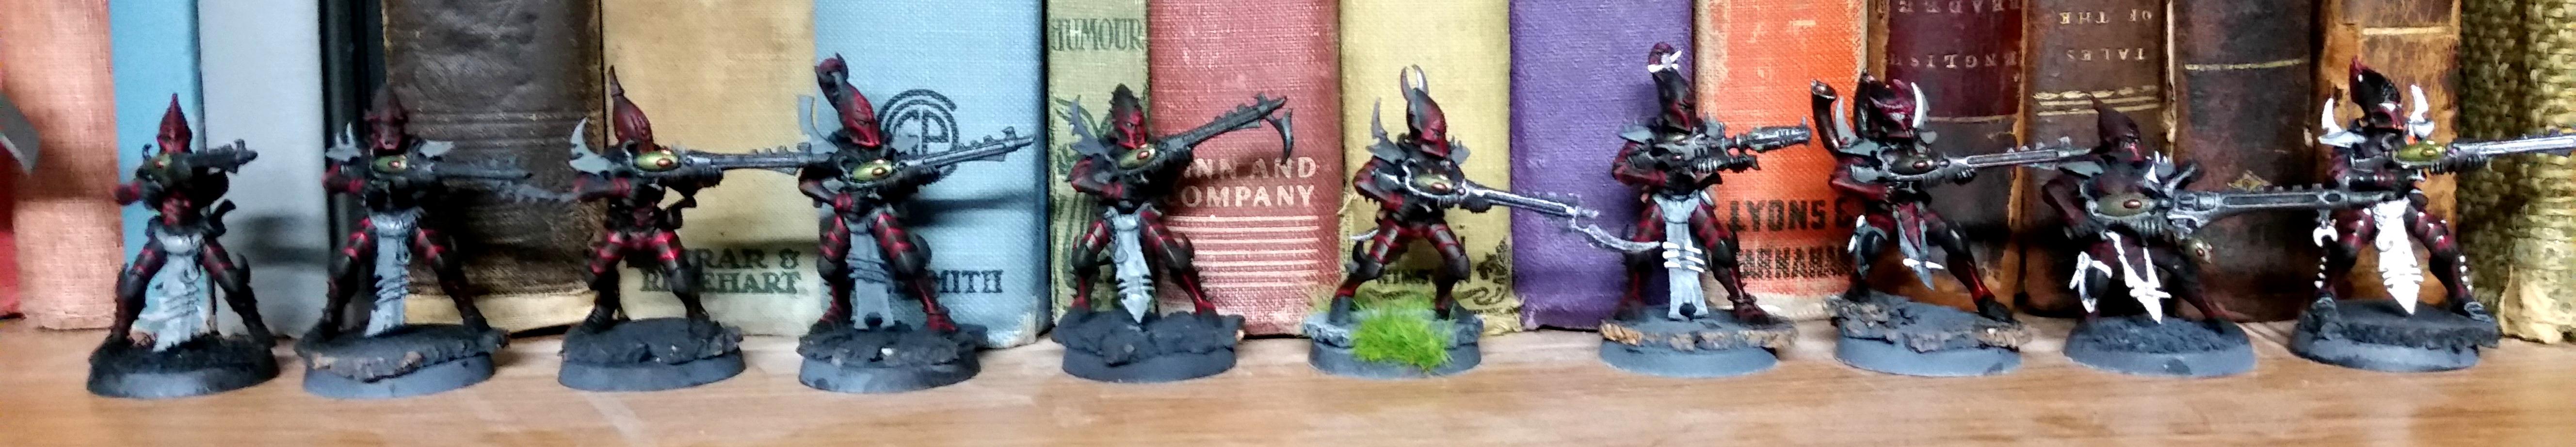 Dark Eldar, Kalabite, Warhammer 40,000